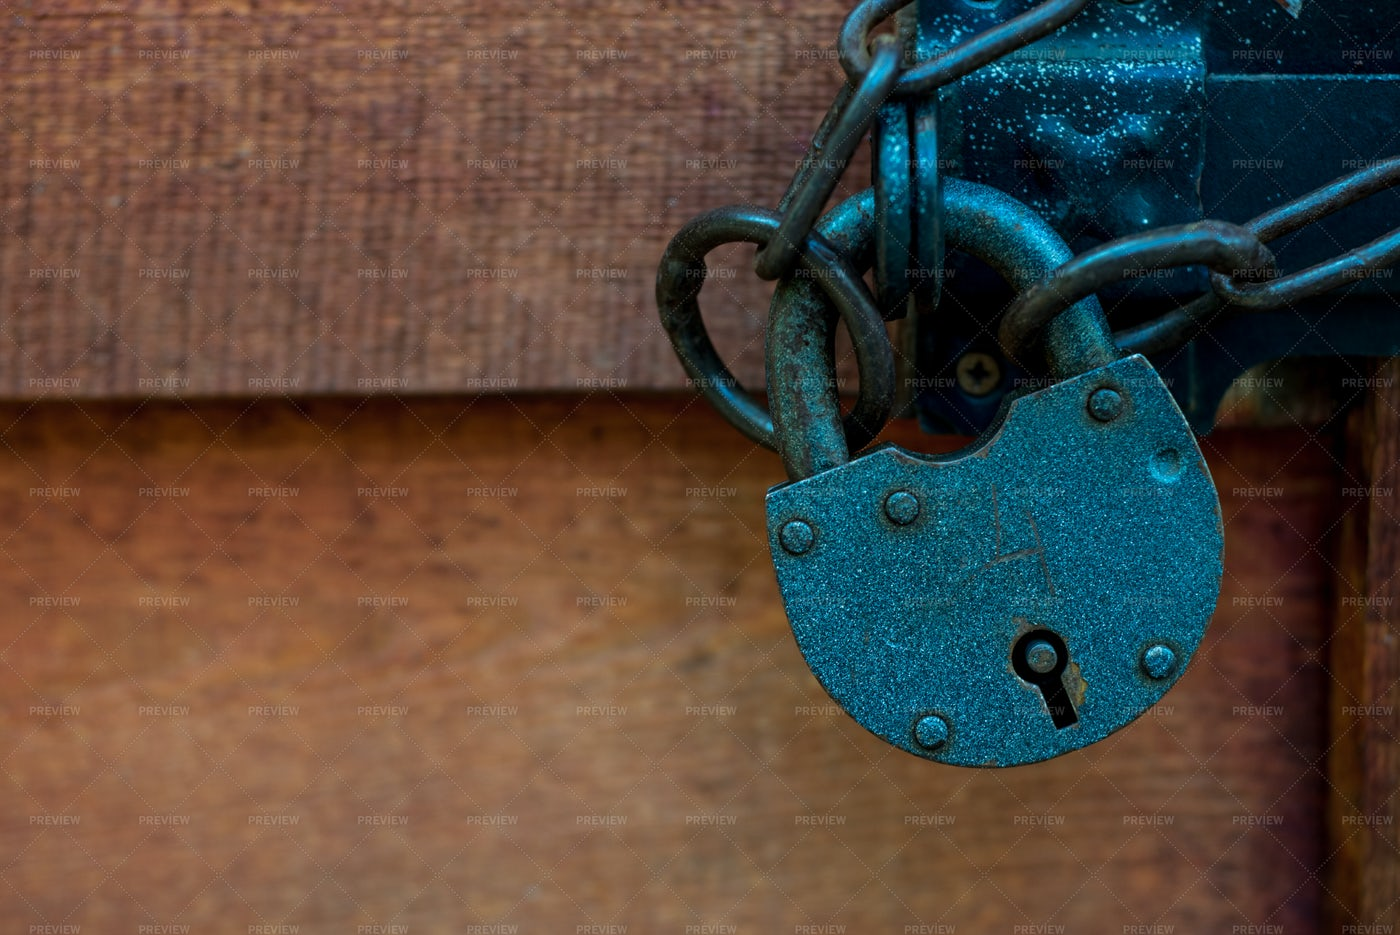 Padlock On A Wooden Door: Stock Photos